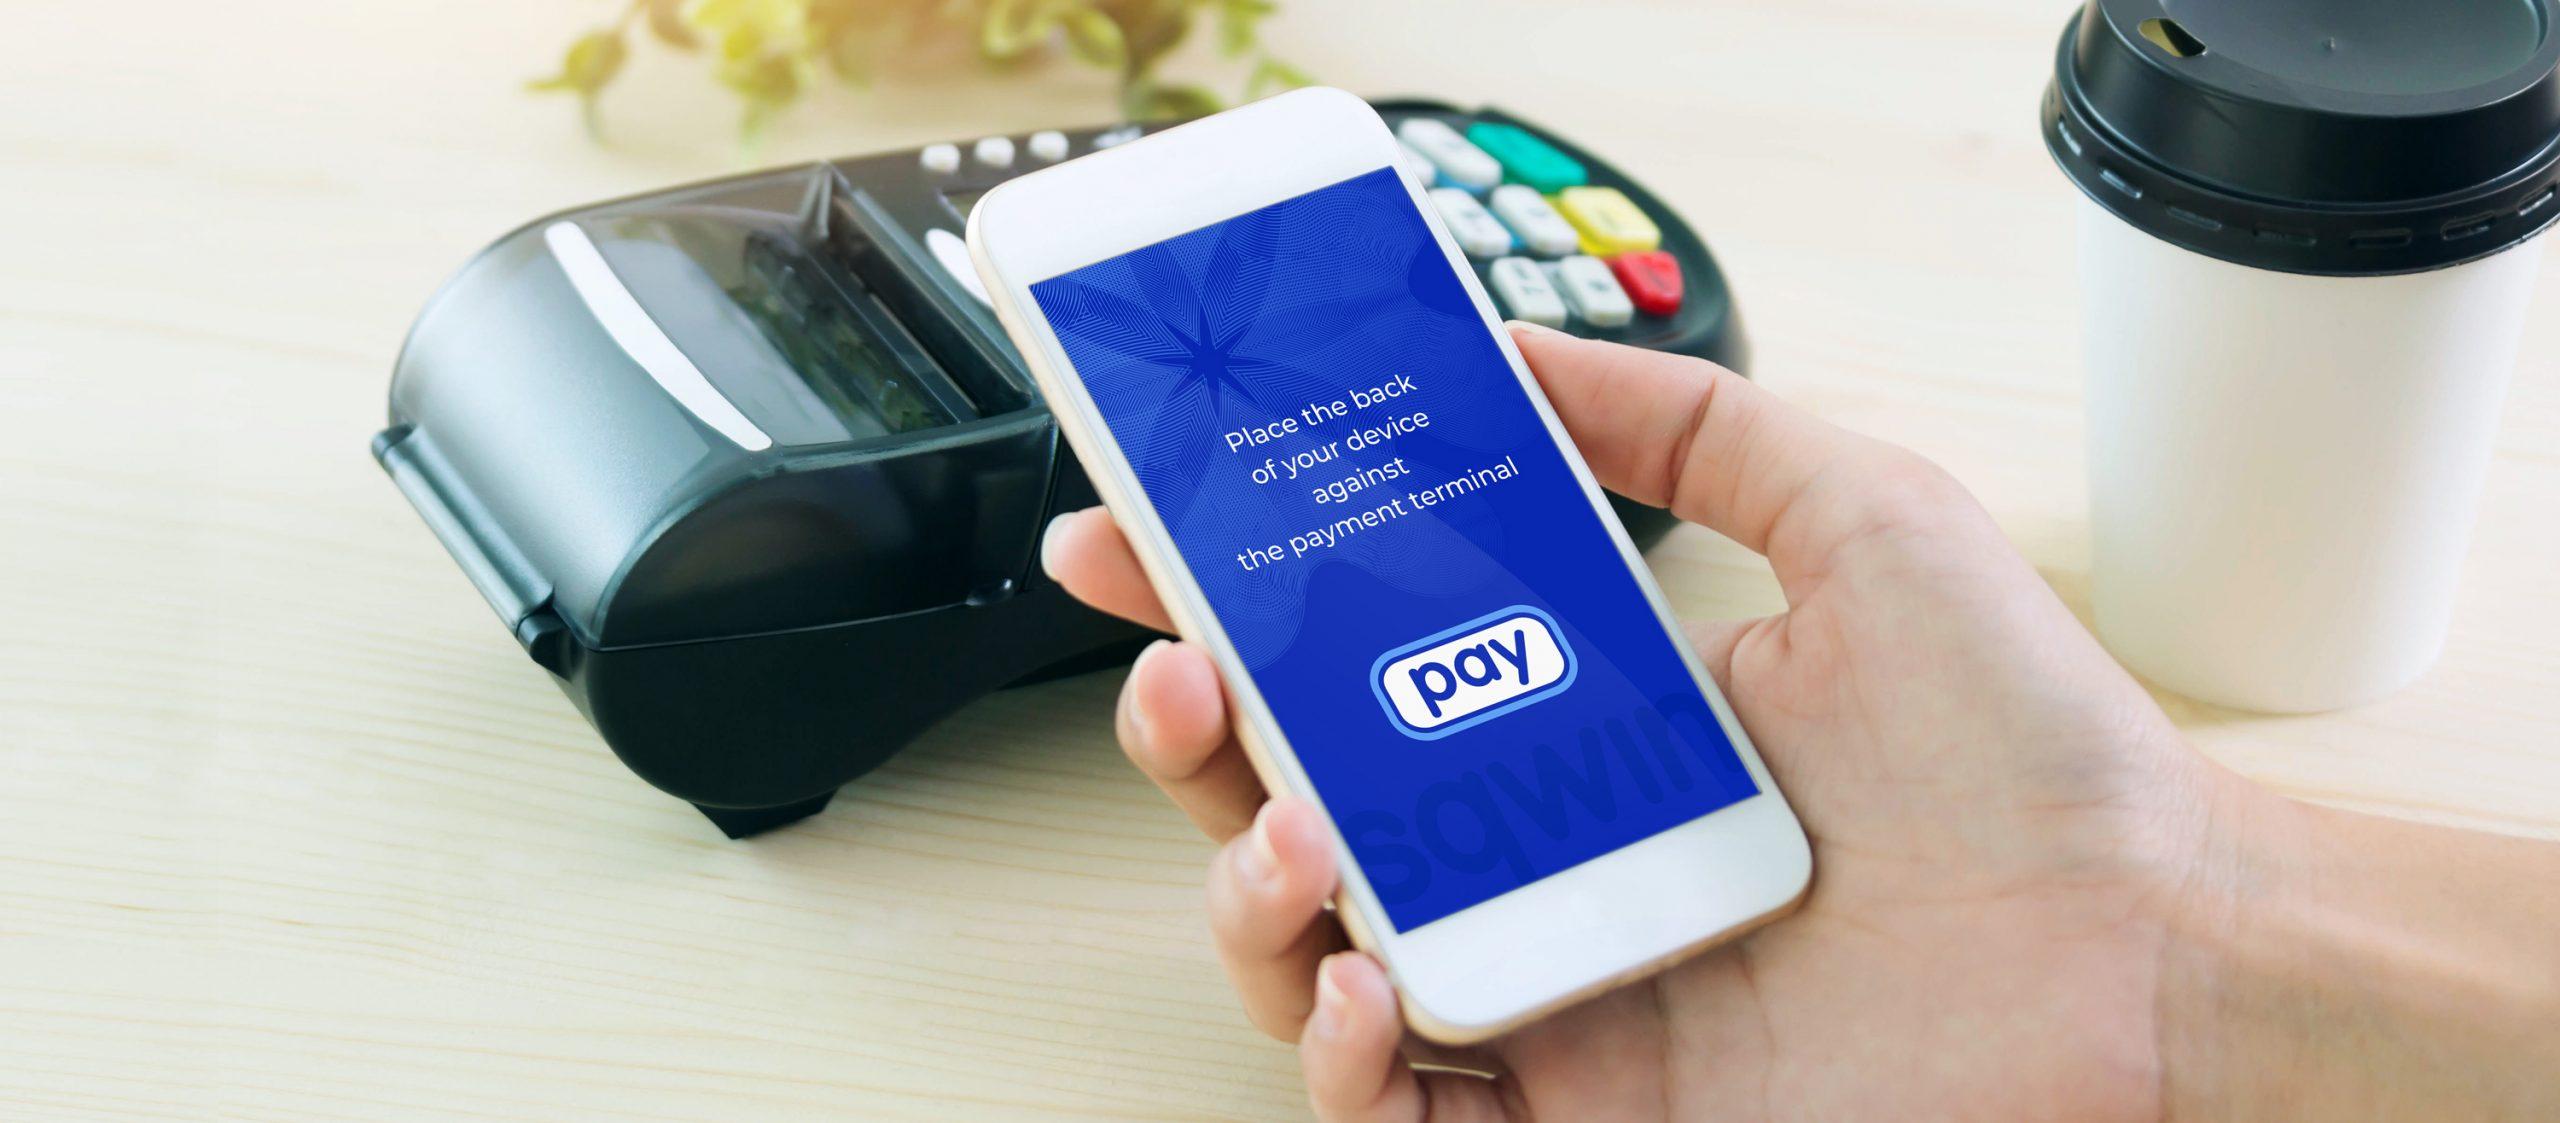 Kontaktloses NFC Bezahlsystem